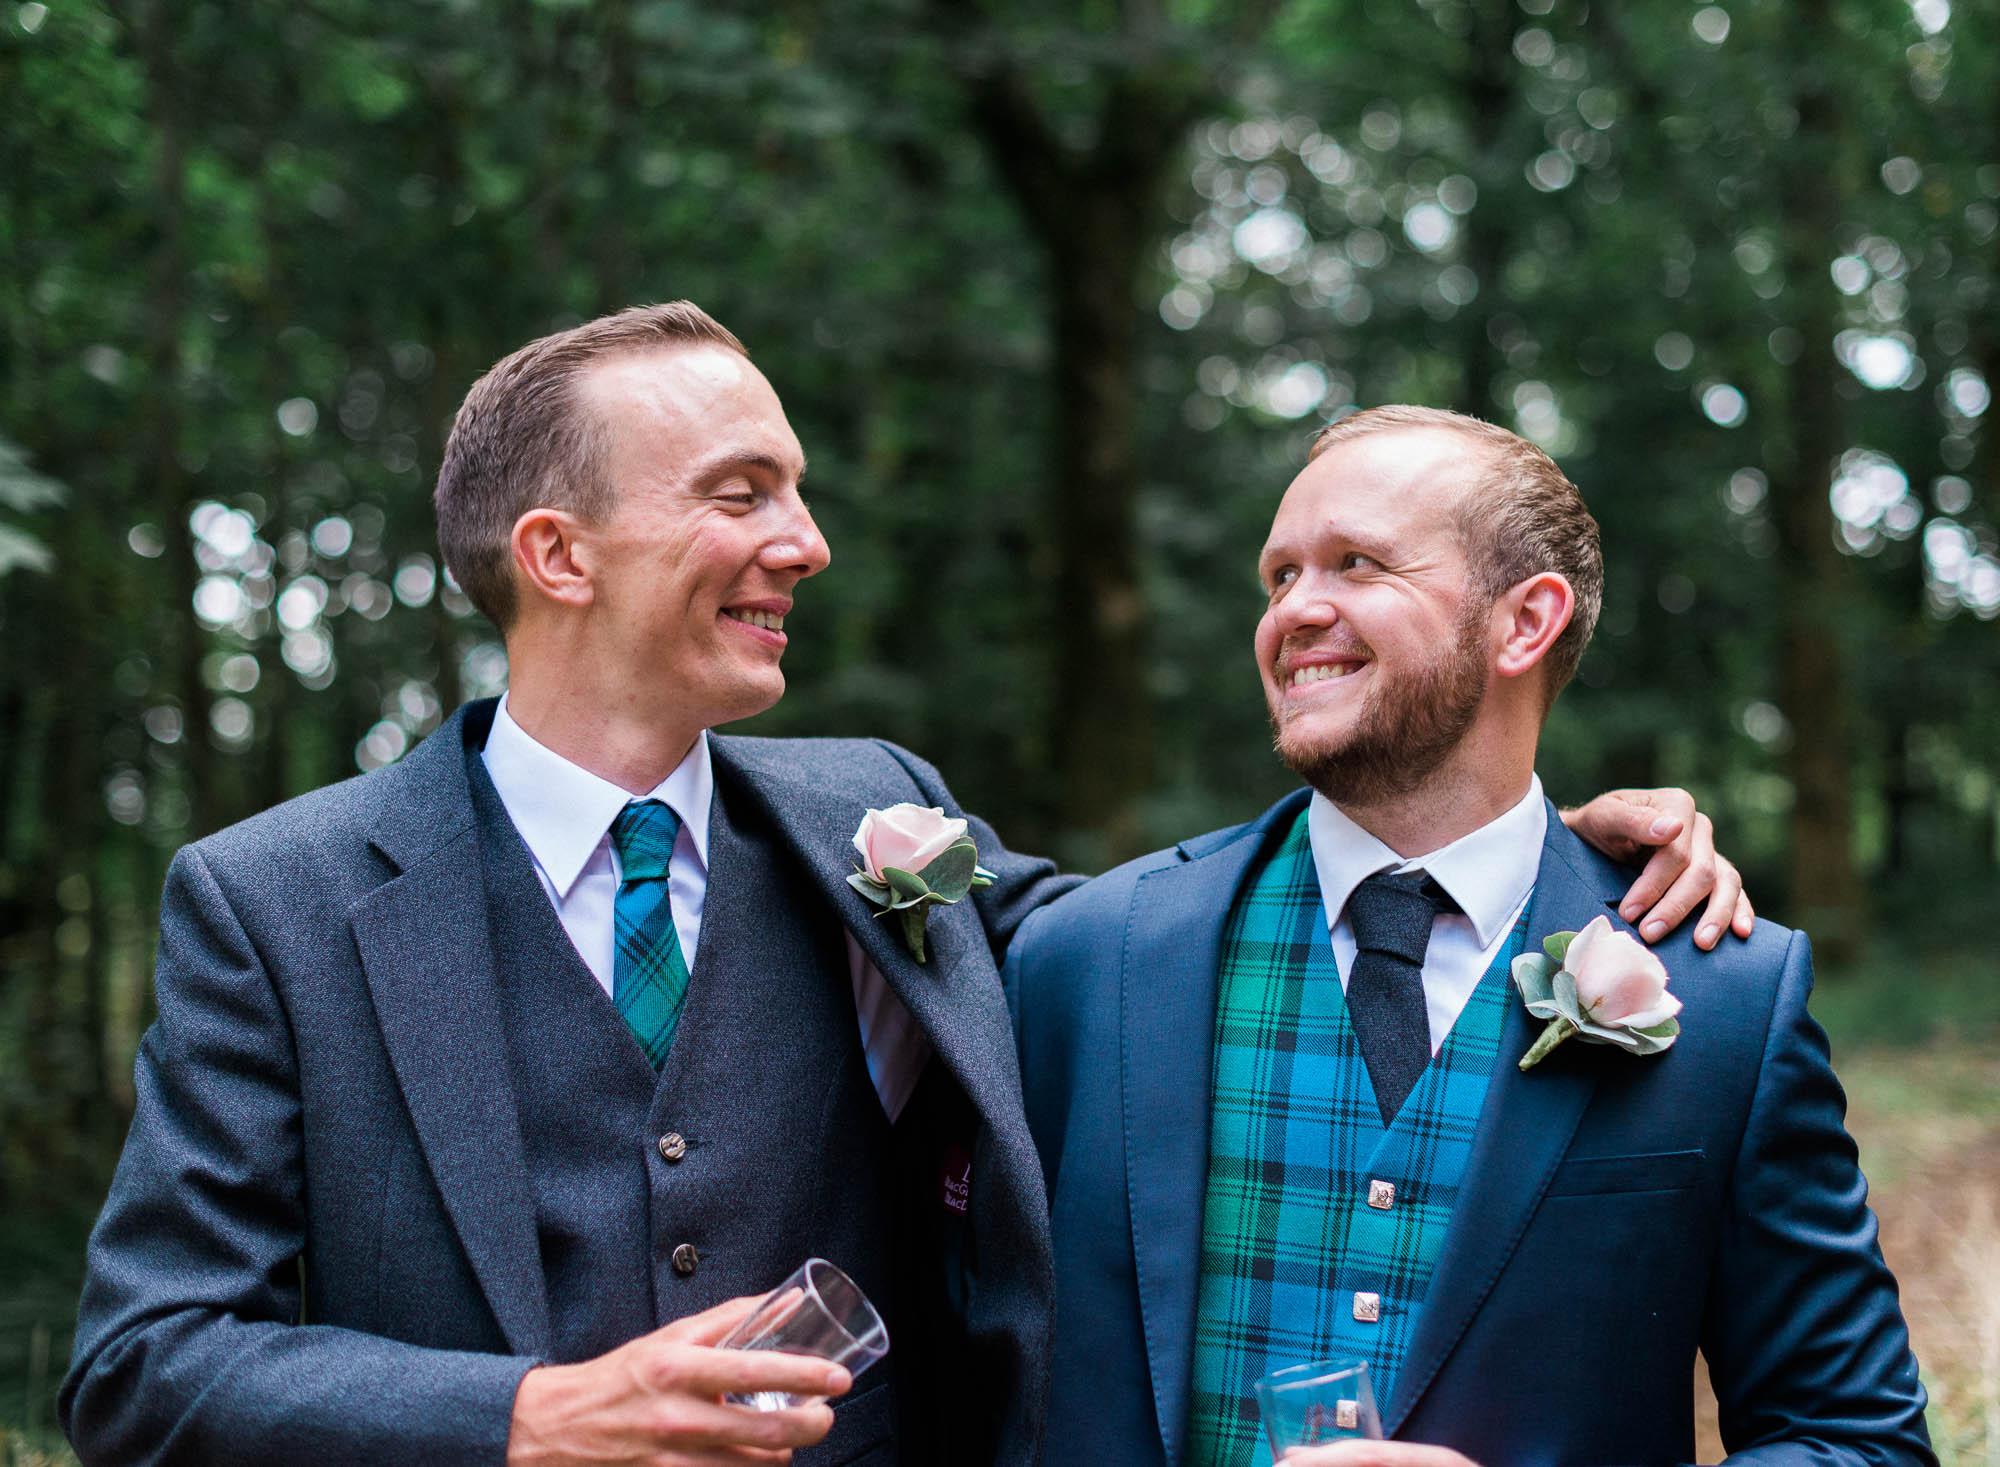 scottish_wedding_blairquhan_castle-28.jpg